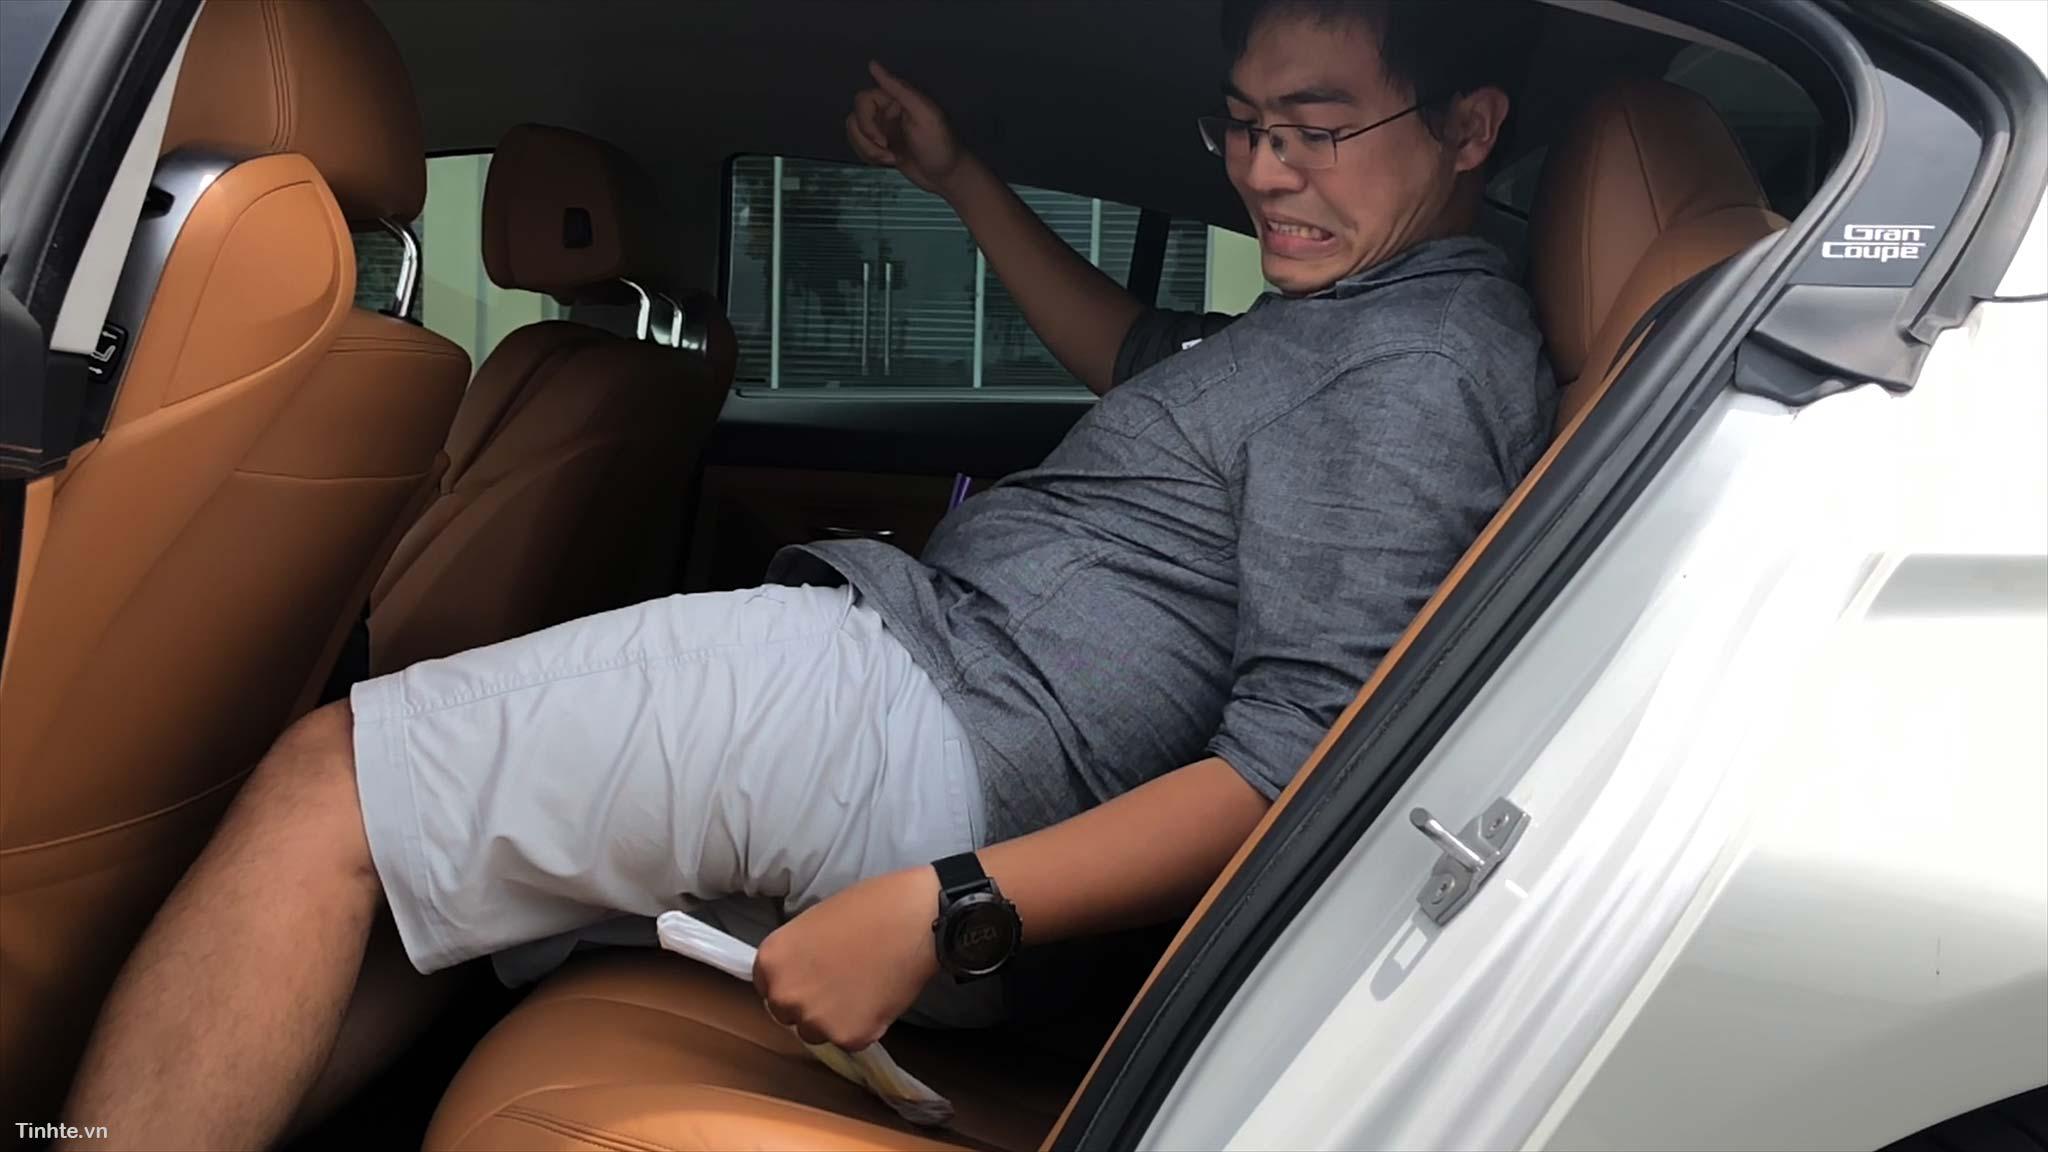 tinhte_tren_tay_dem_dit_han_quoc_balance_seat_6.jpg